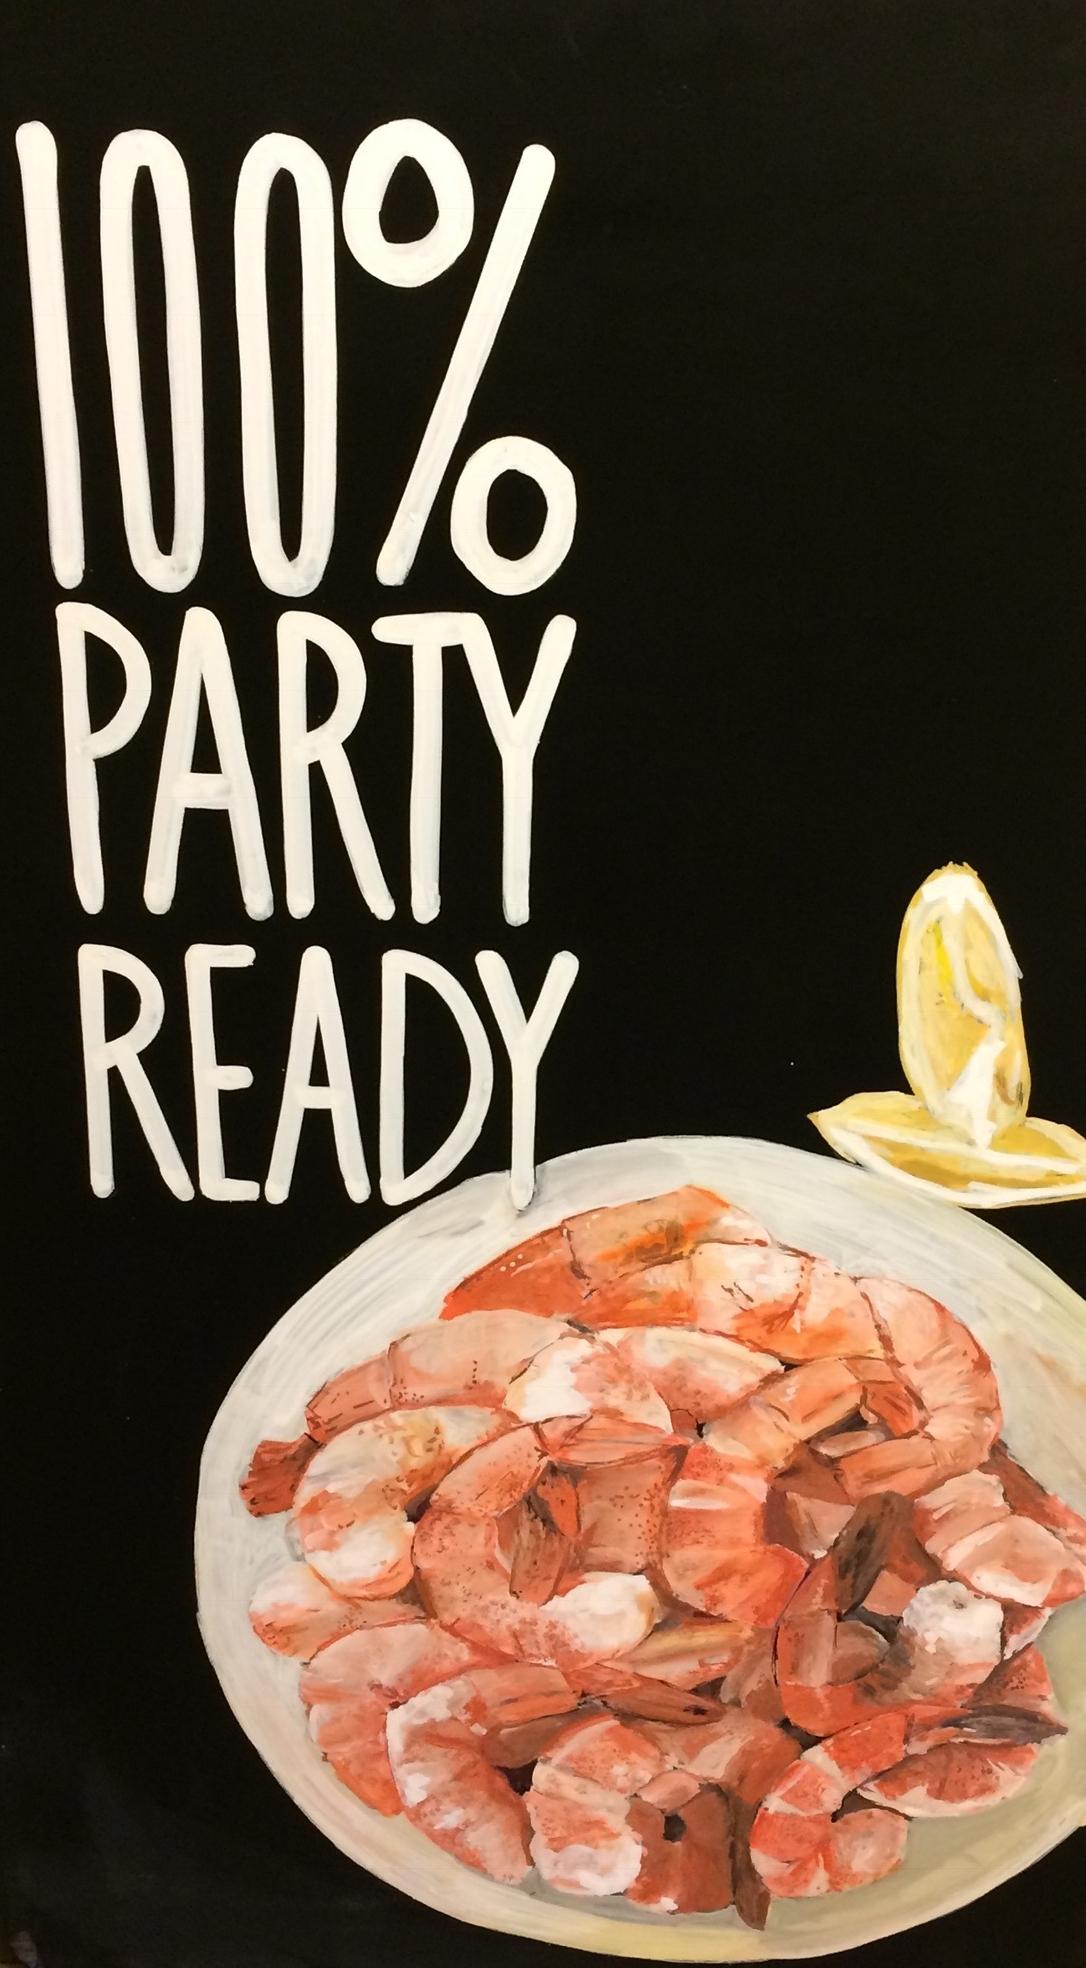 lettering:illustration: 100% party ready shrimp.jpg